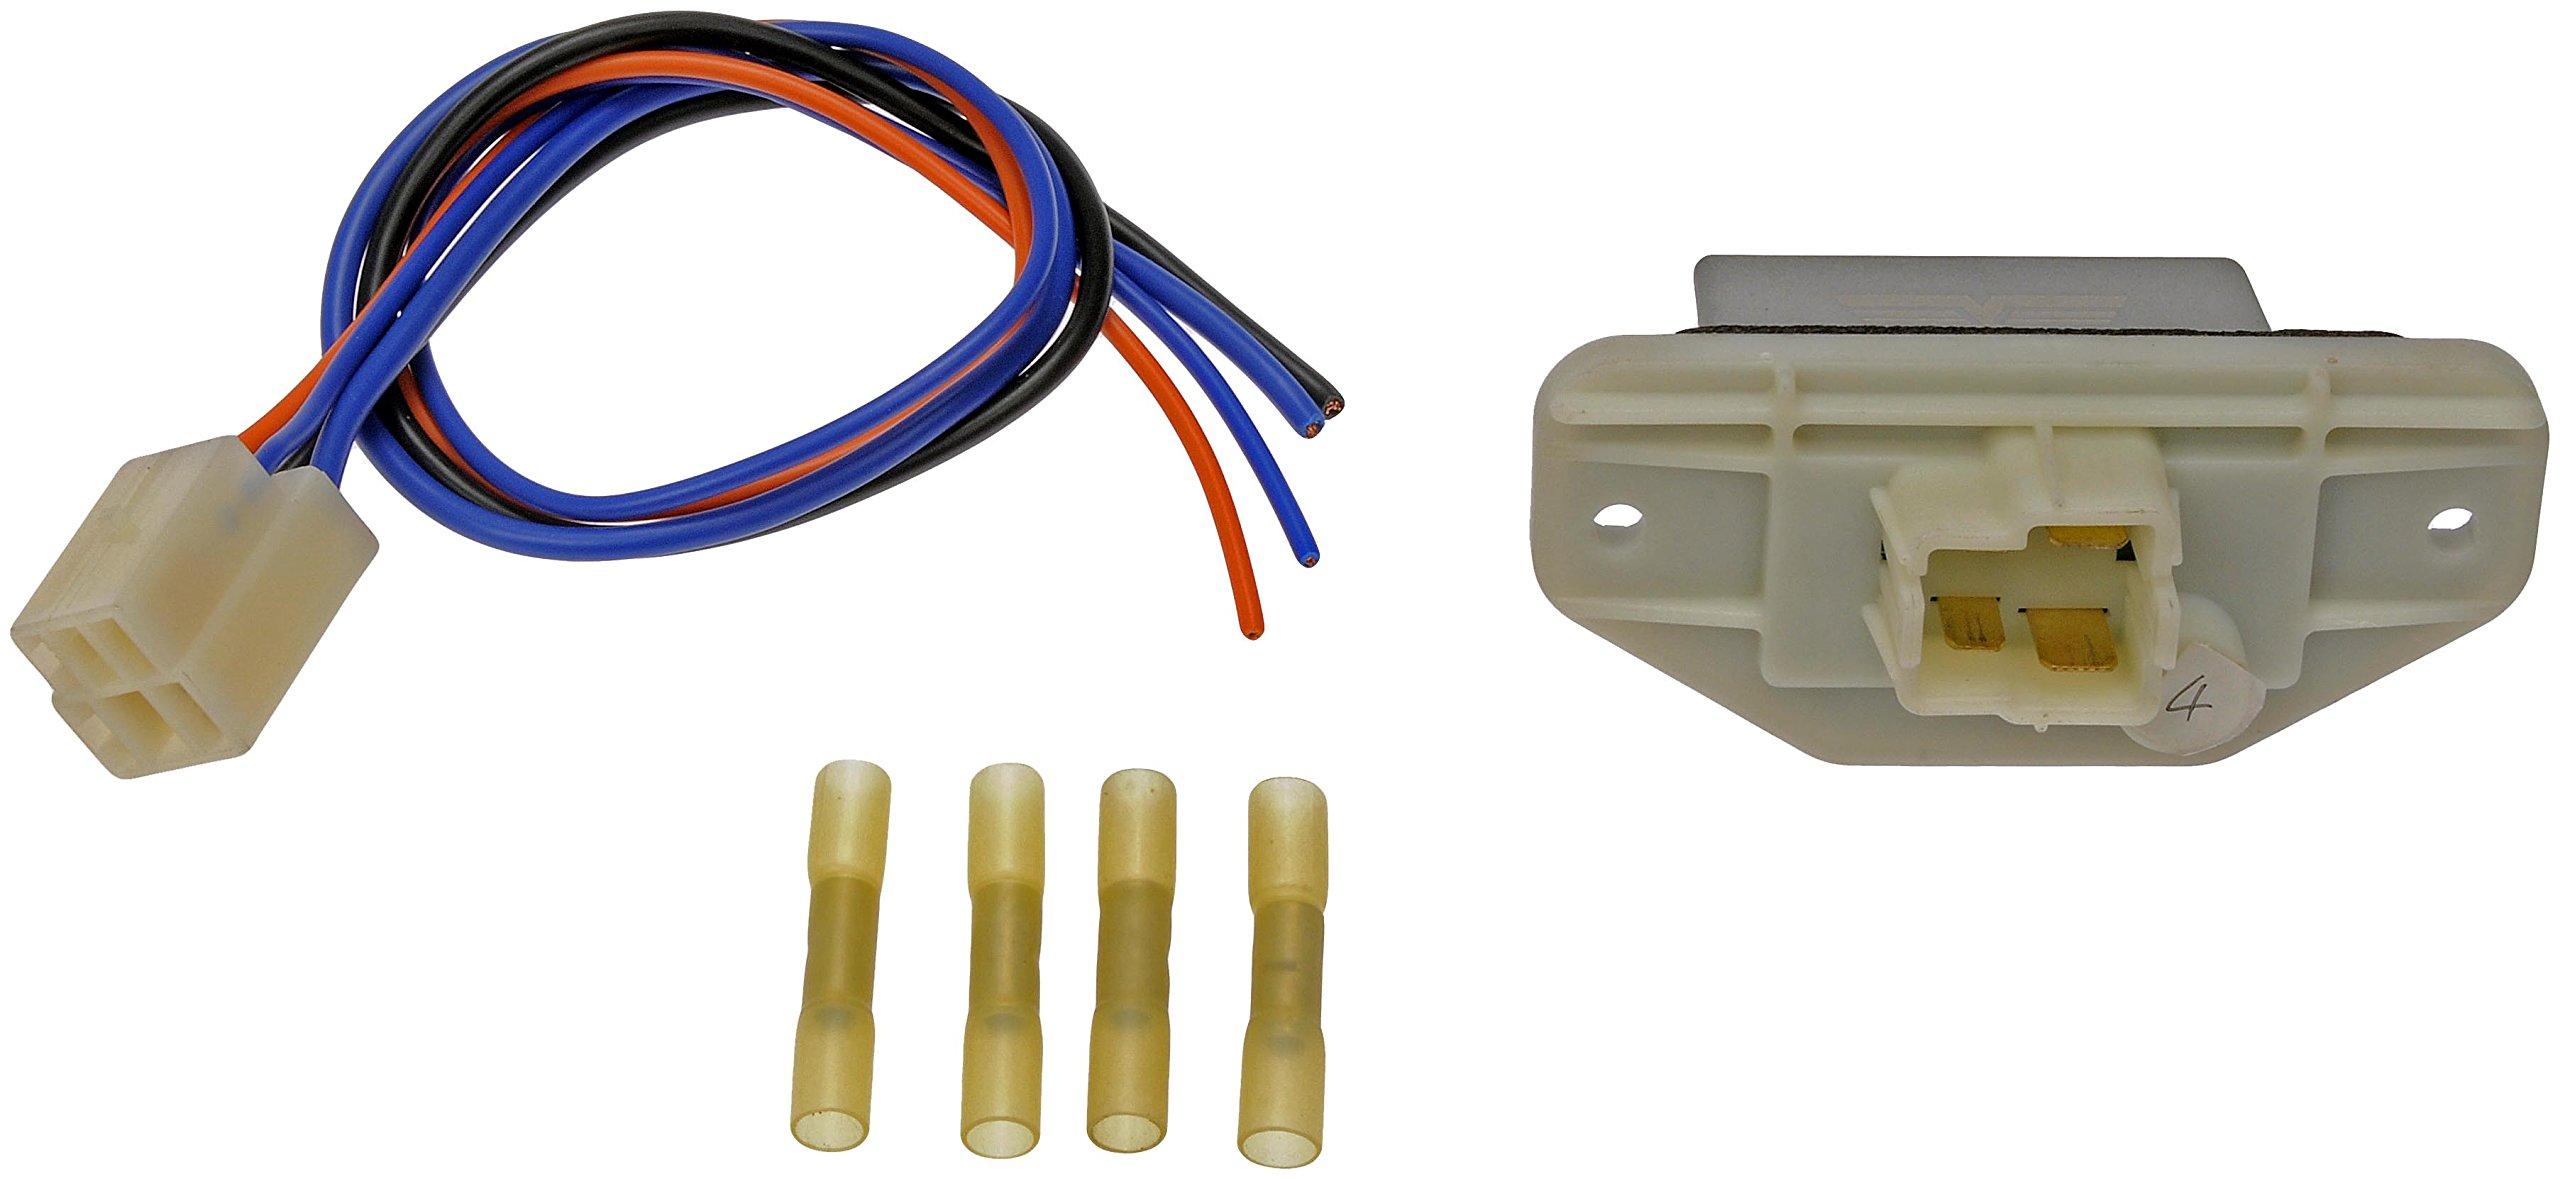 Dorman 973-547 HVAC Blower Motor Resistor Kit with Harness